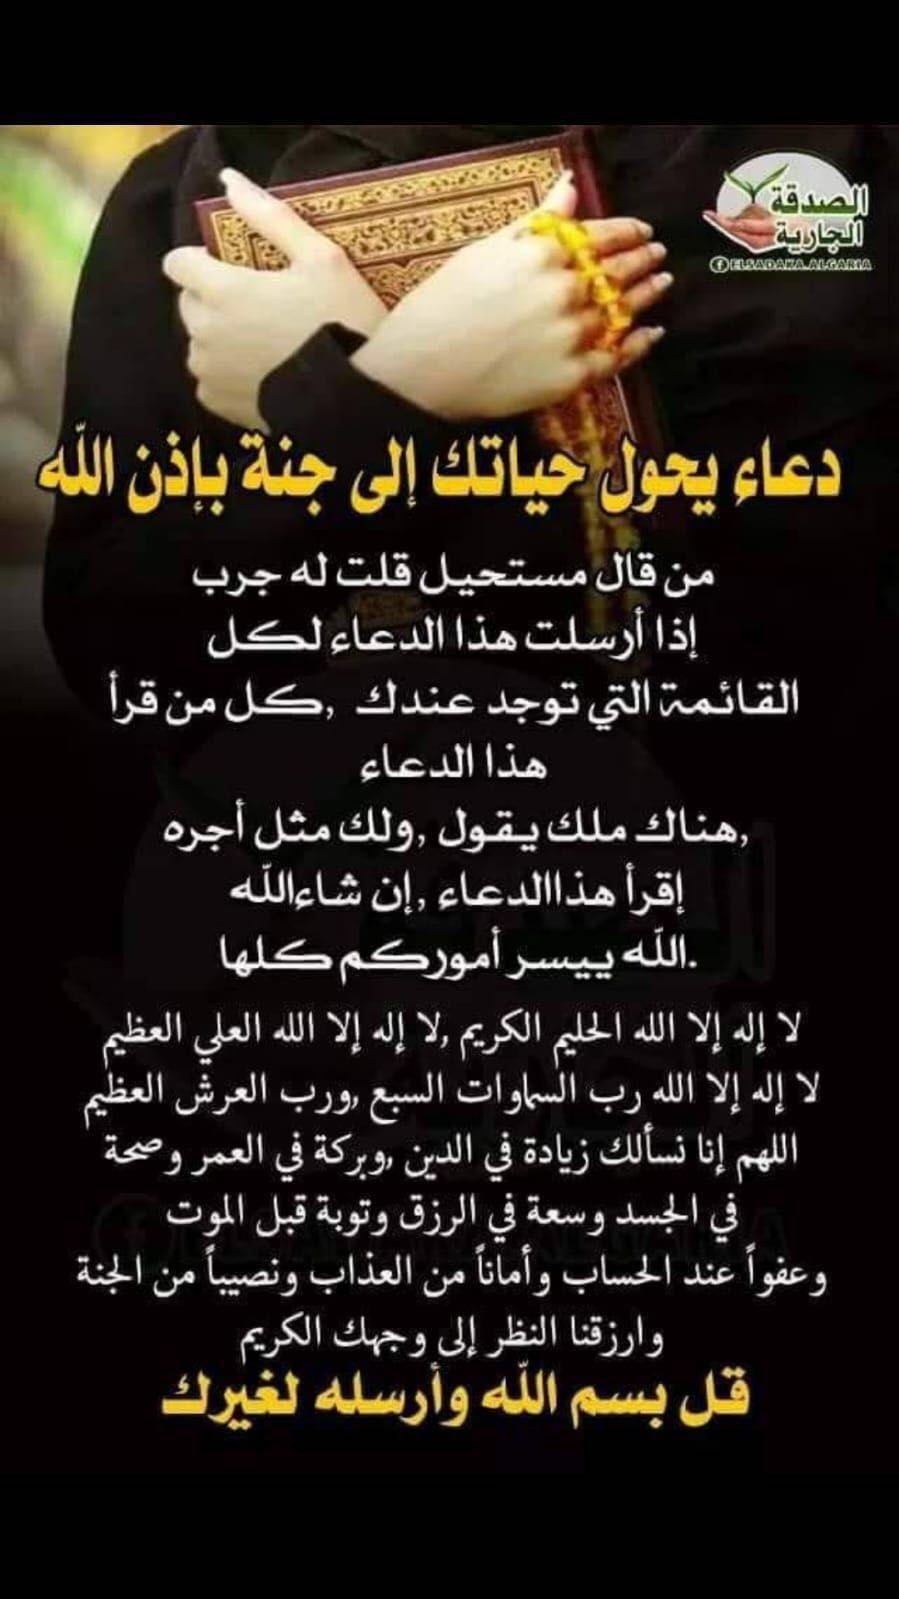 Pin By Sidra On اذكارات Islam Facts Islam Beliefs Islamic Phrases